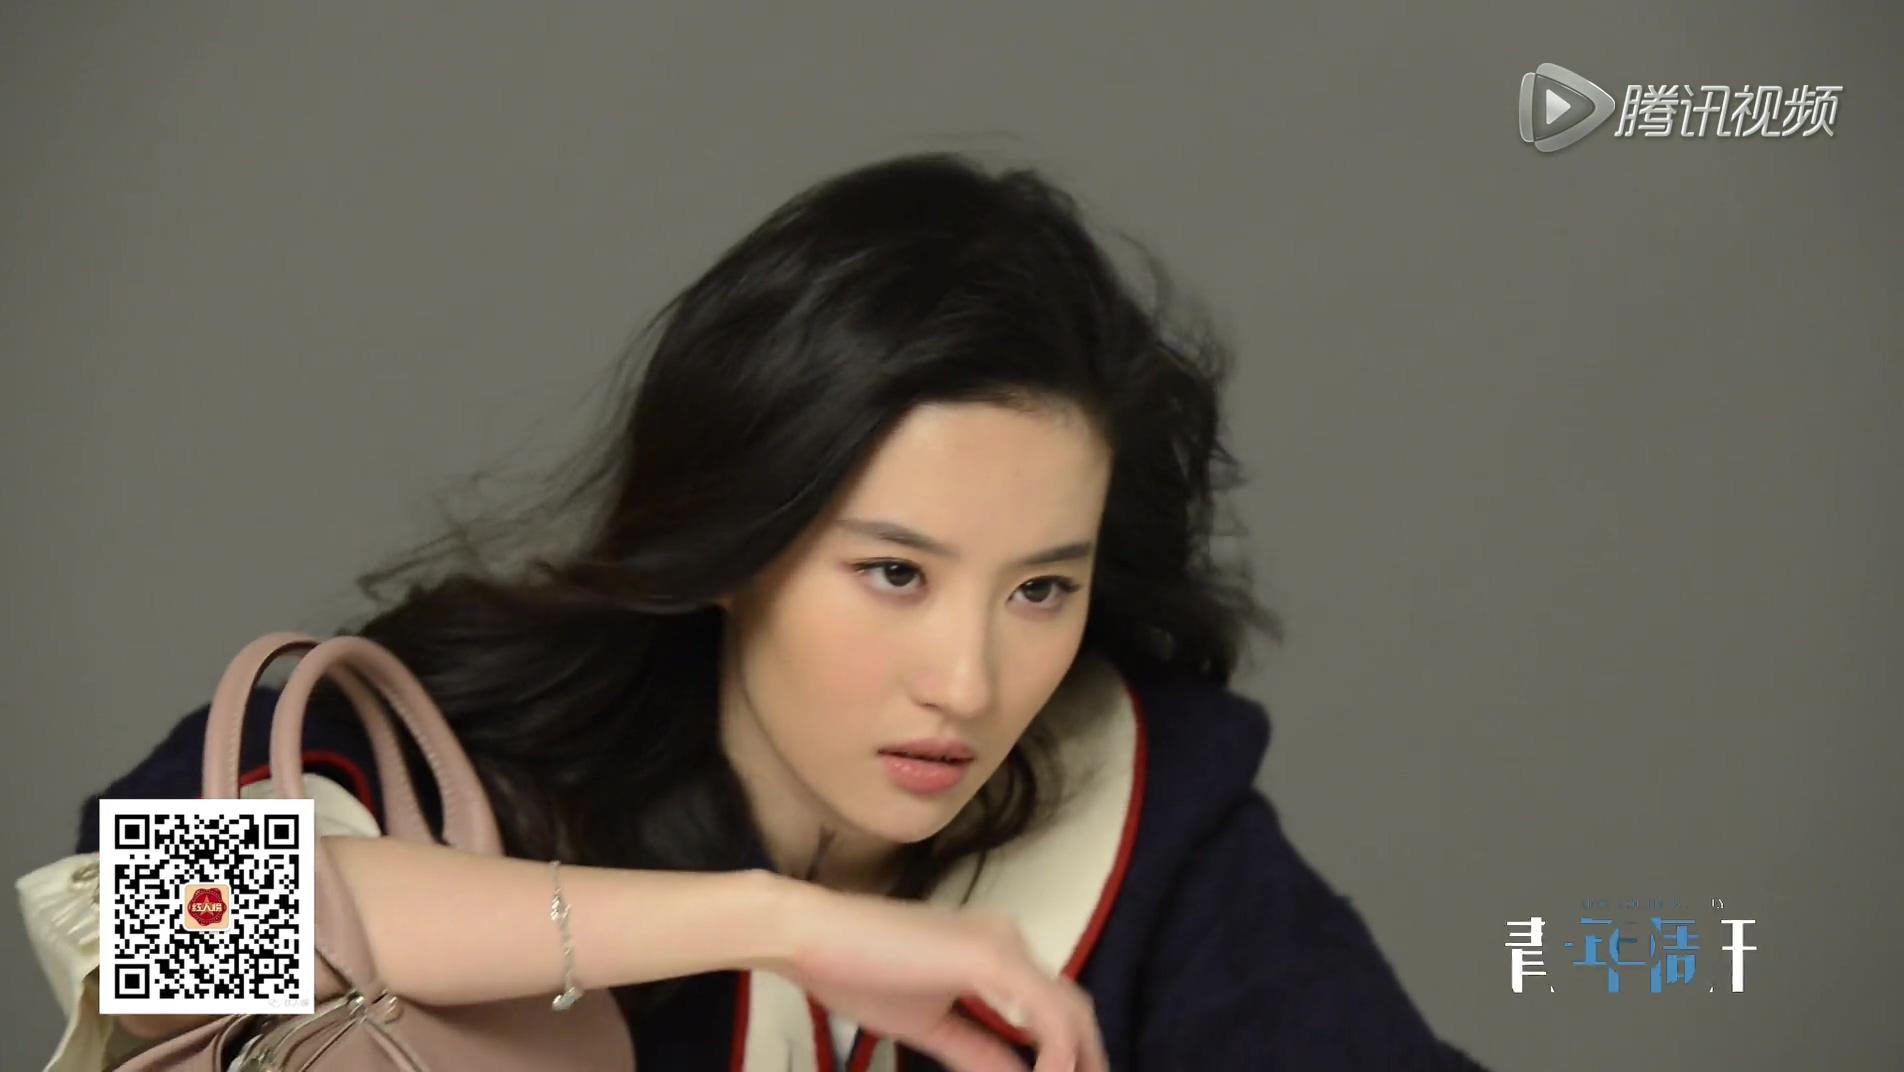 《北京青年周刊》花絮(2015.08.27)